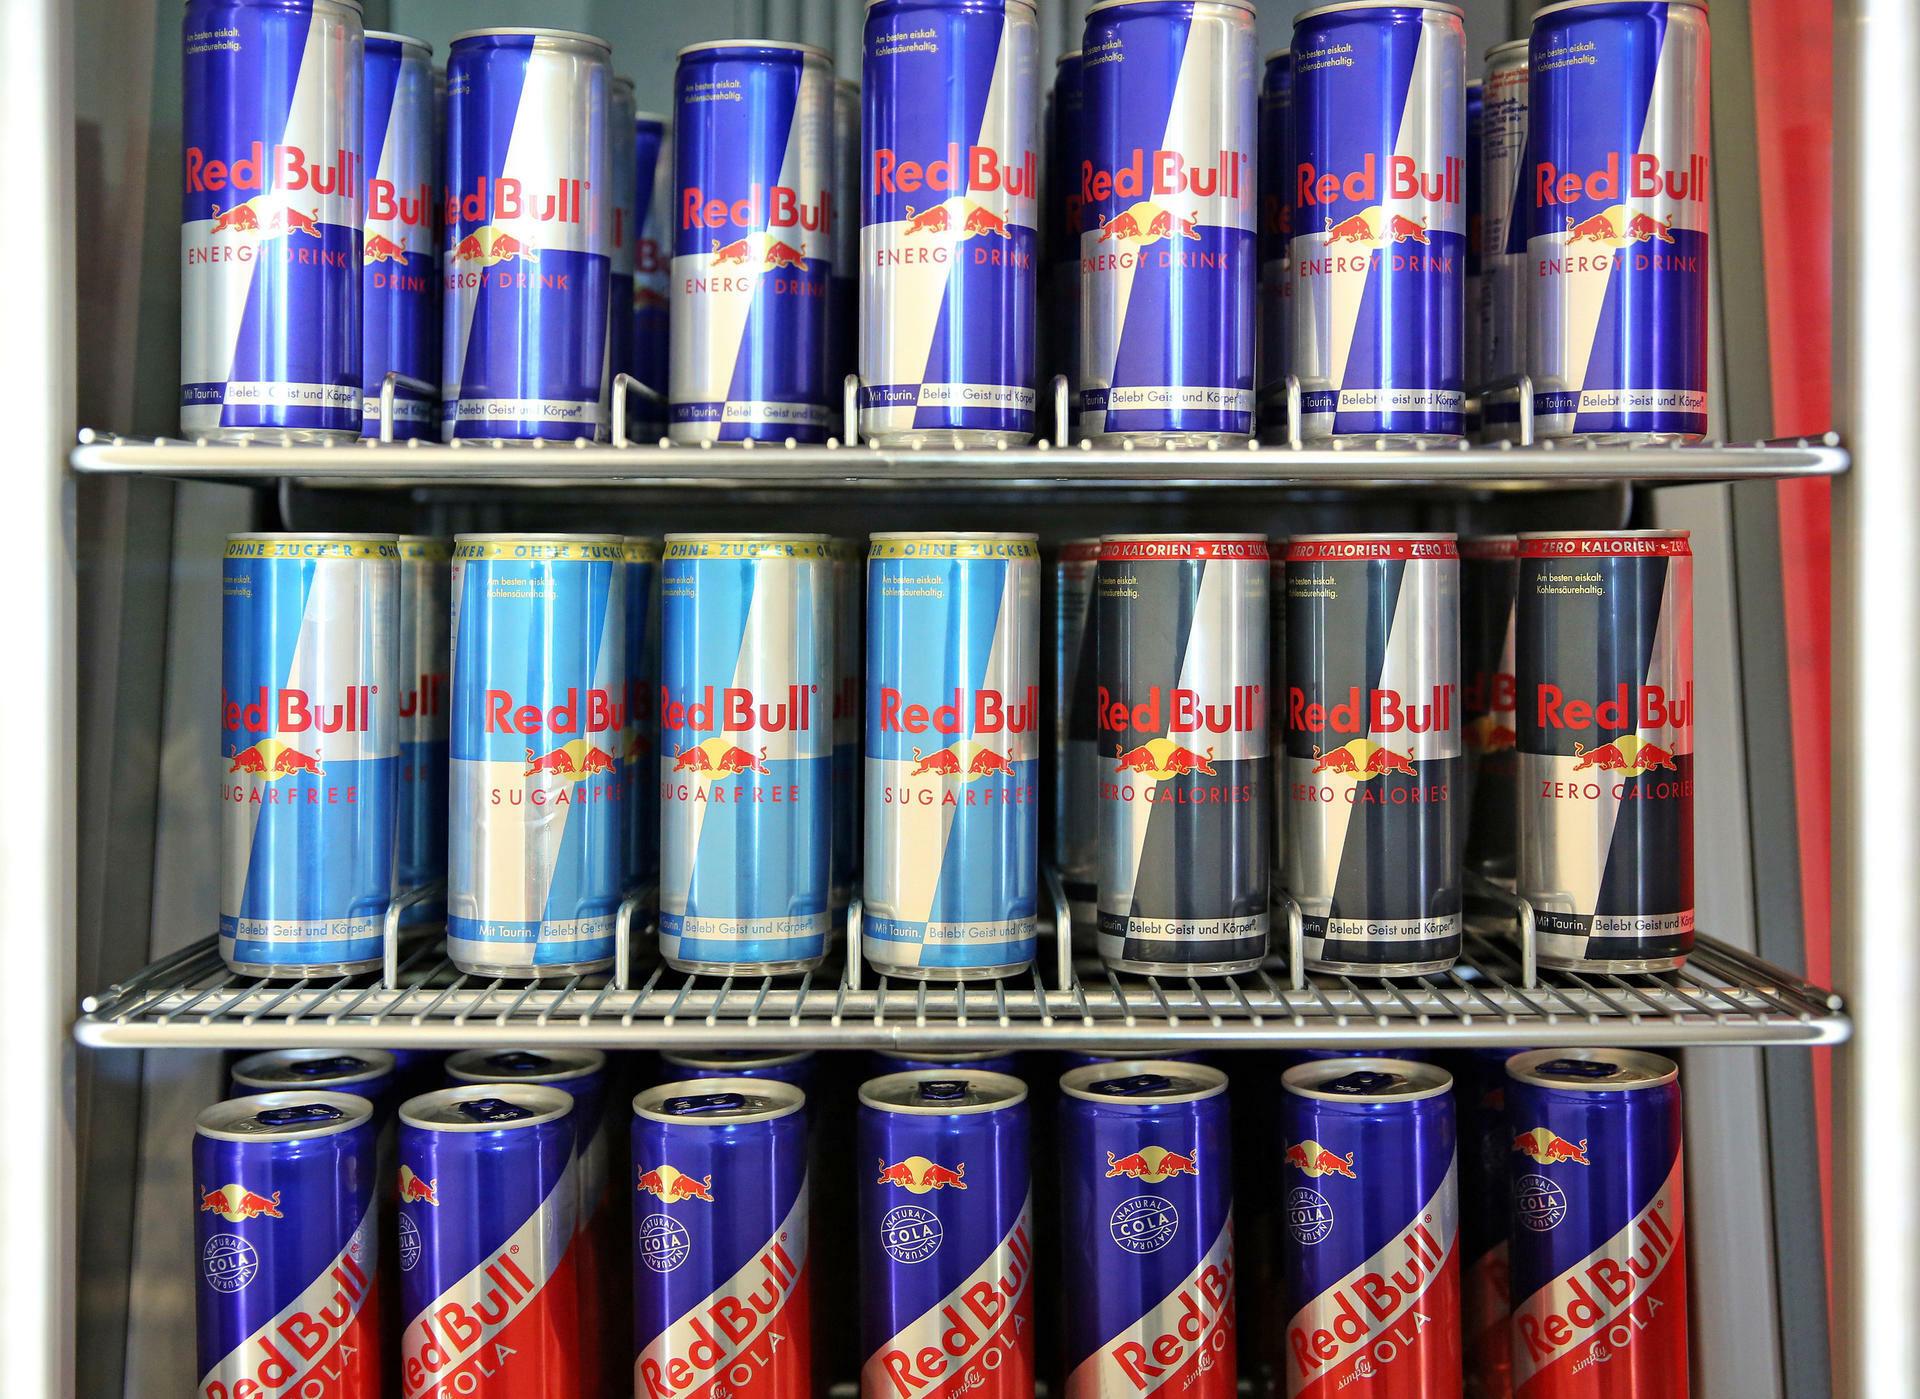 Red Bull Kühlschrank Verkaufen : Getränkeriese red bull steigert umsatz